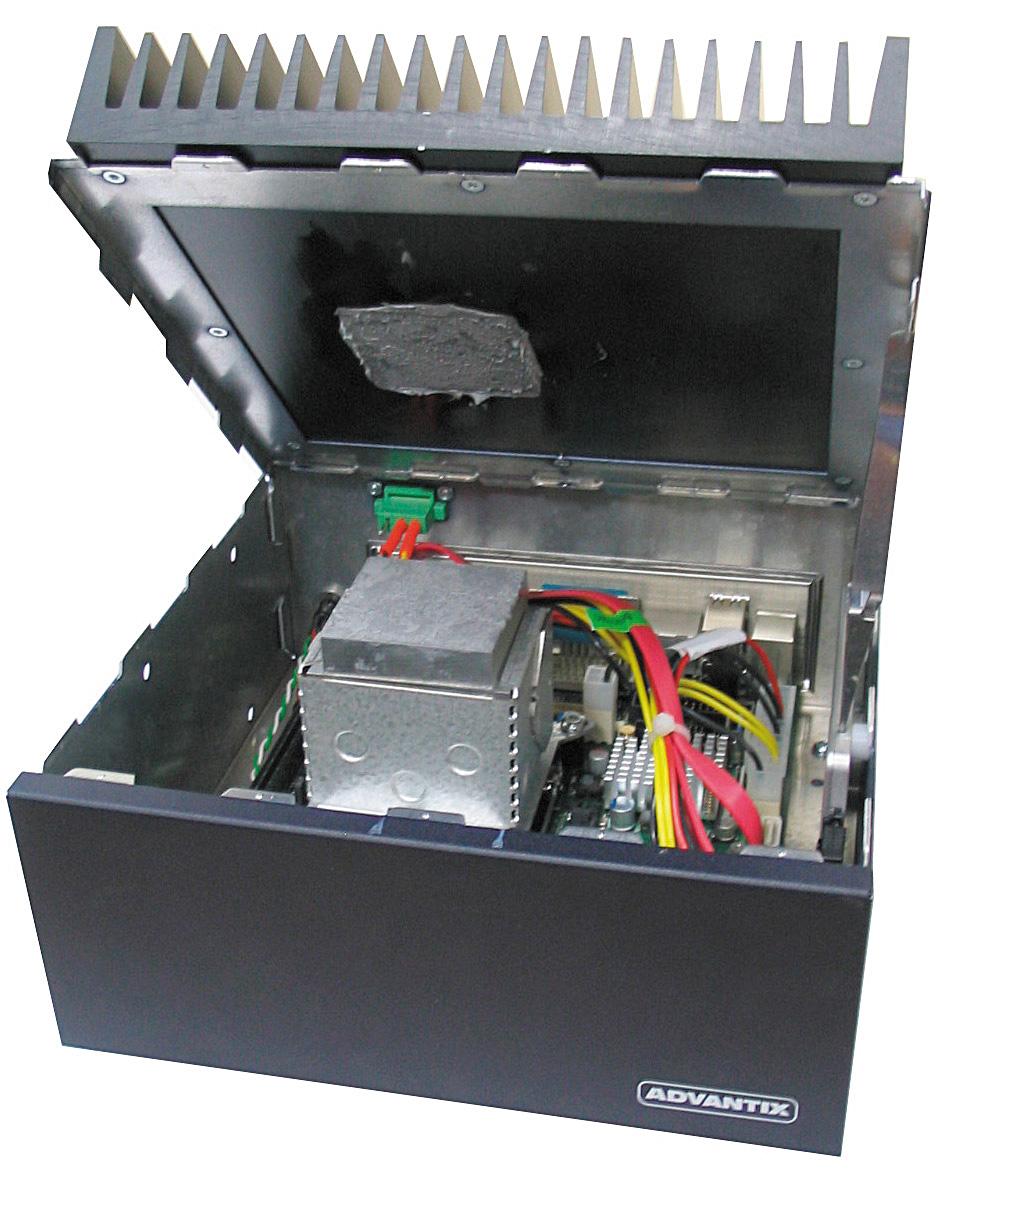 Компьютер AdvantiX ER-6000